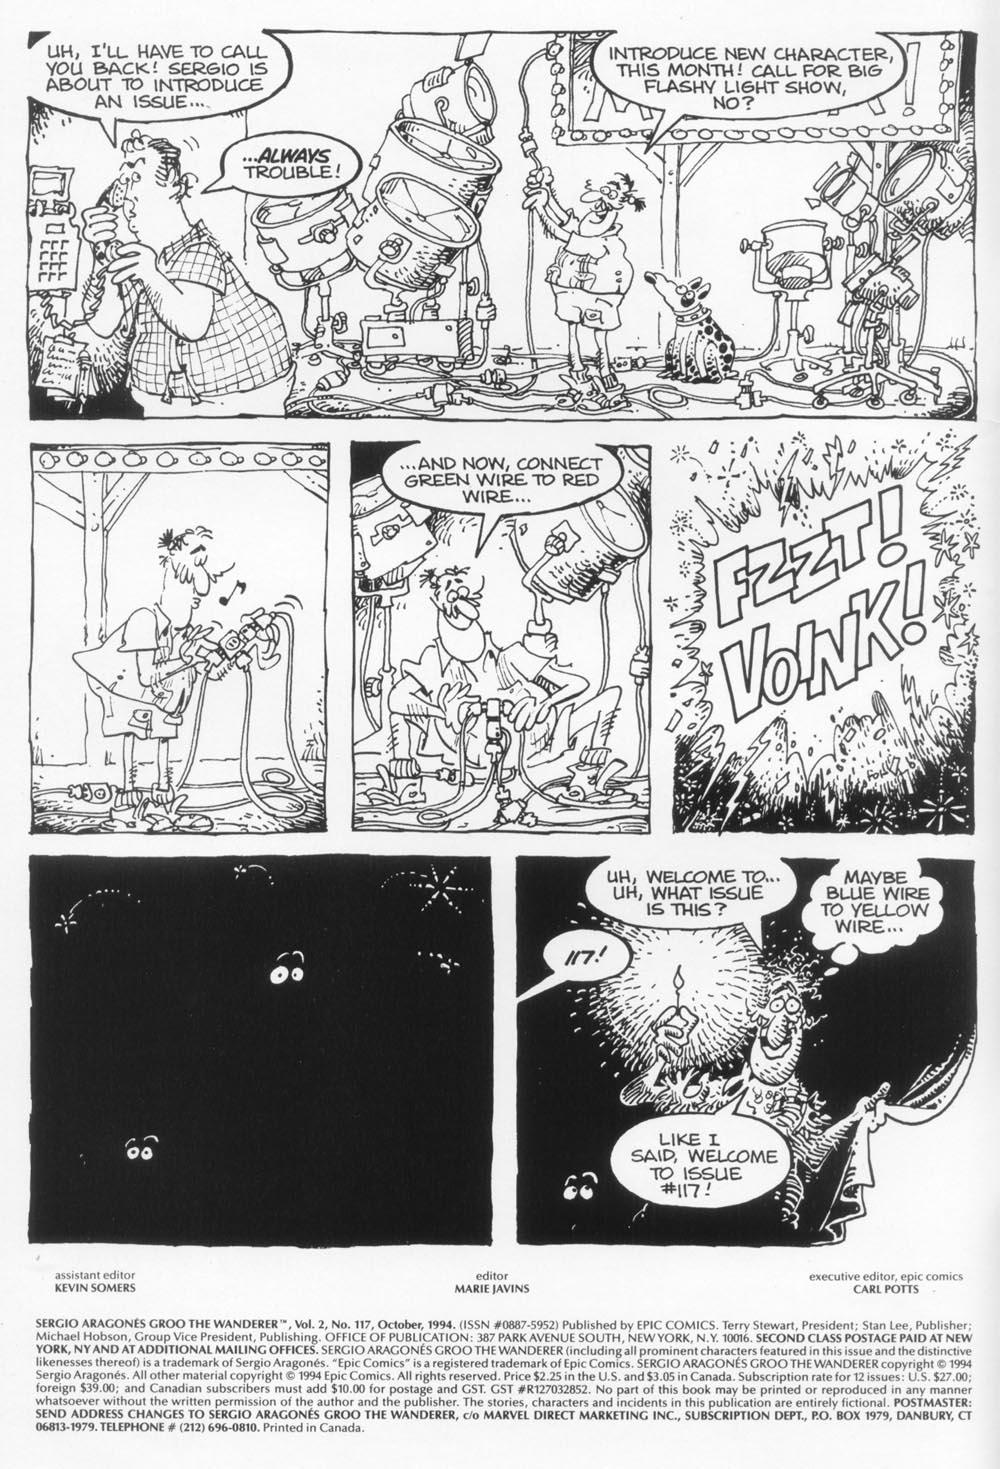 Read online Sergio Aragonés Groo the Wanderer comic -  Issue #117 - 2